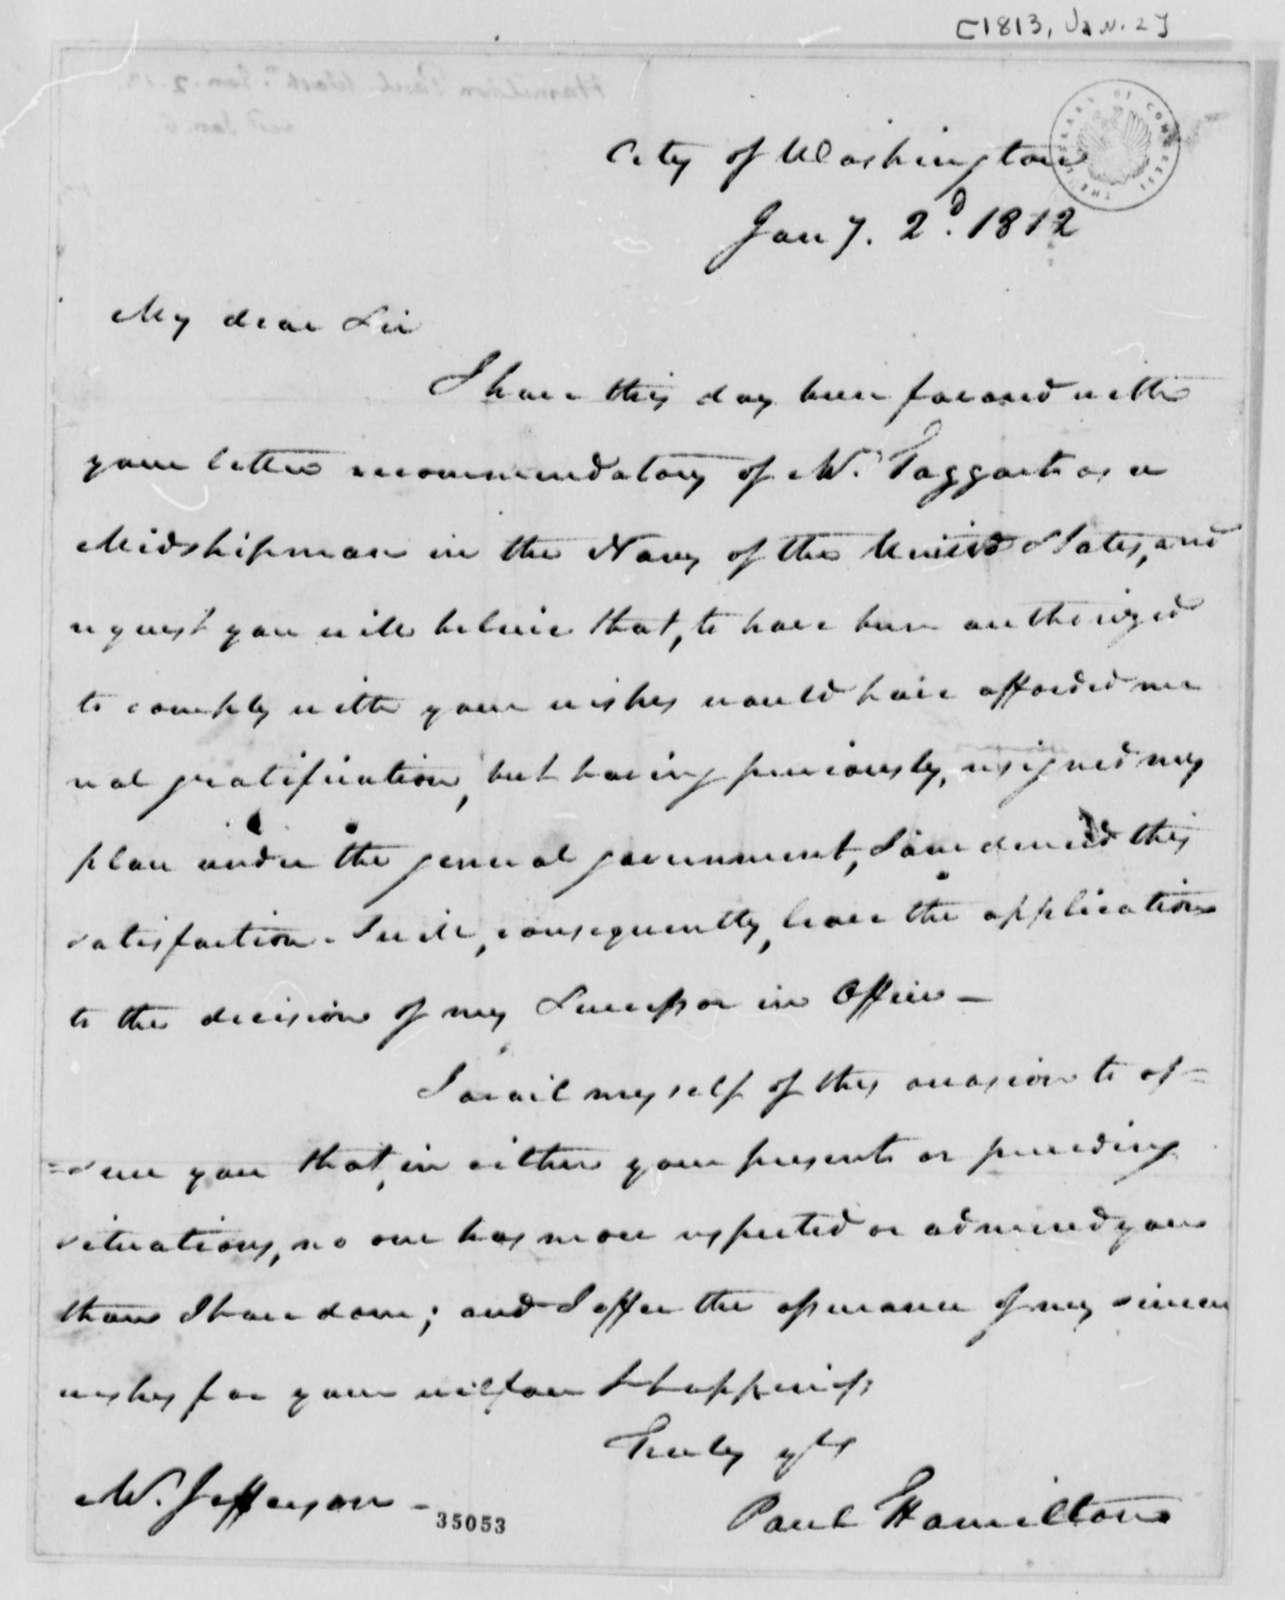 Paul Hamilton, January 2, 1813